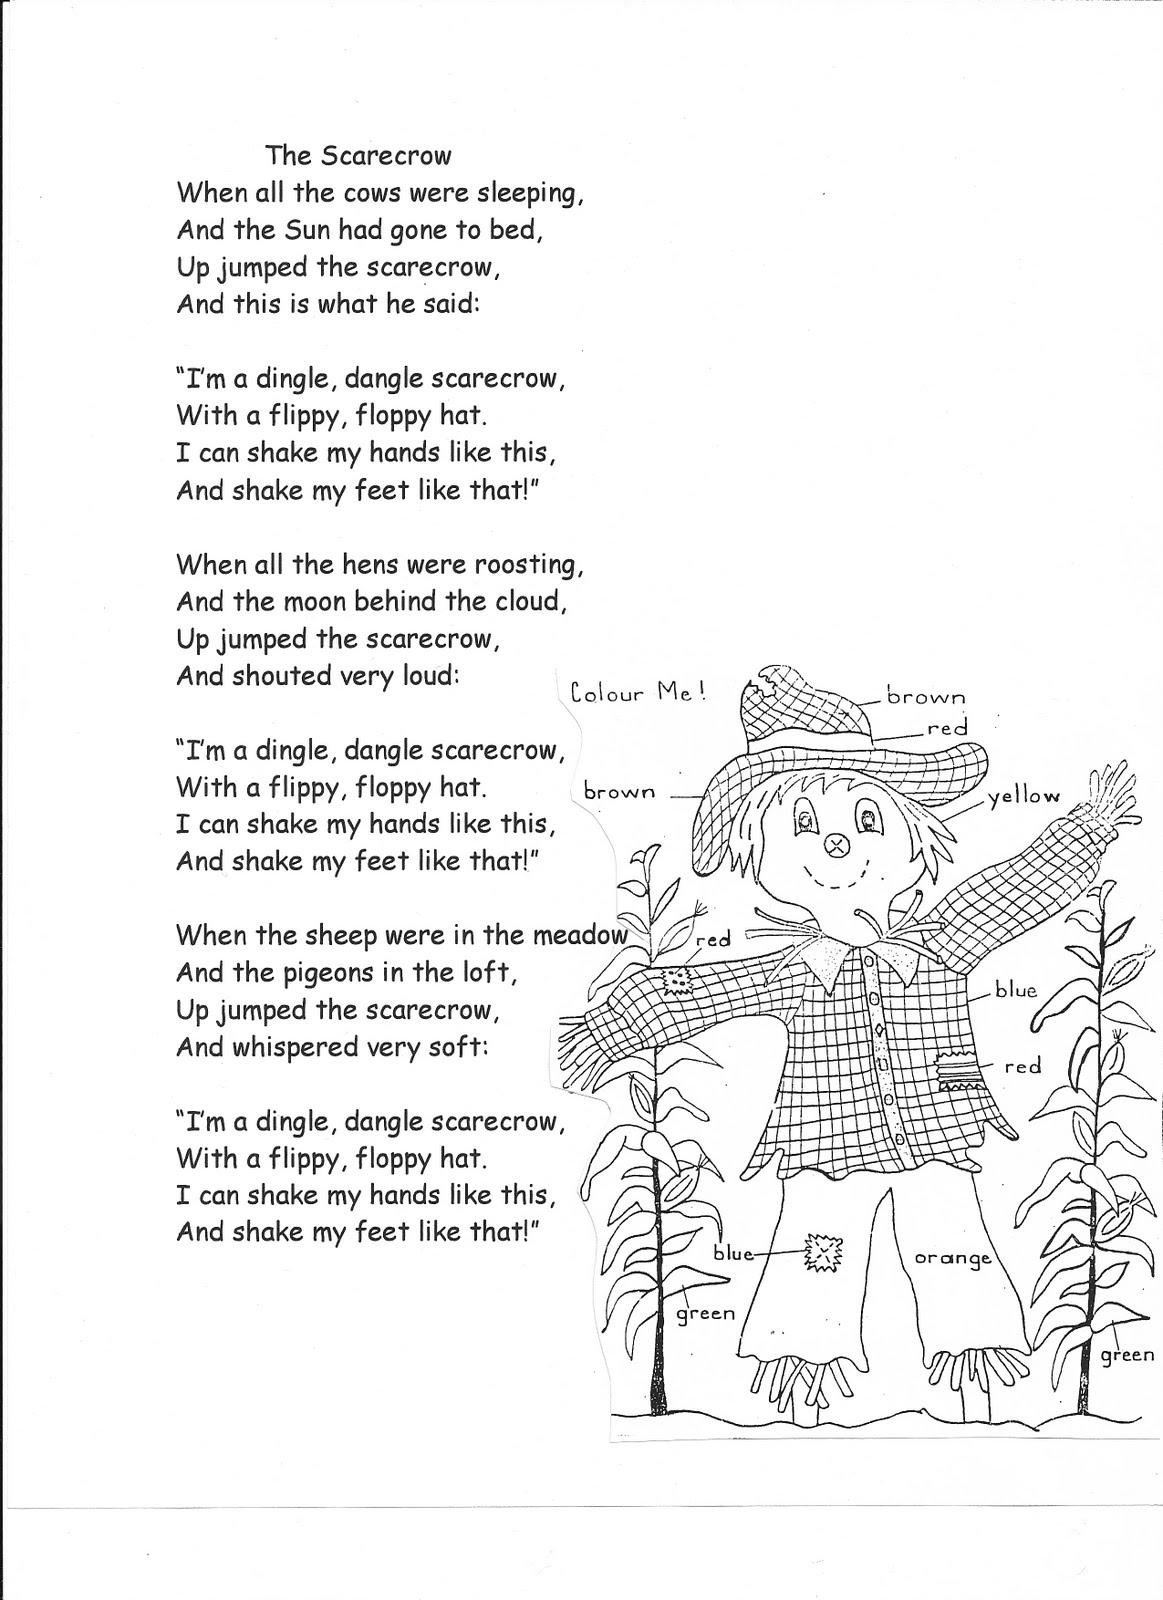 Curriculum Tips The Dingle Dangle Scarecrow